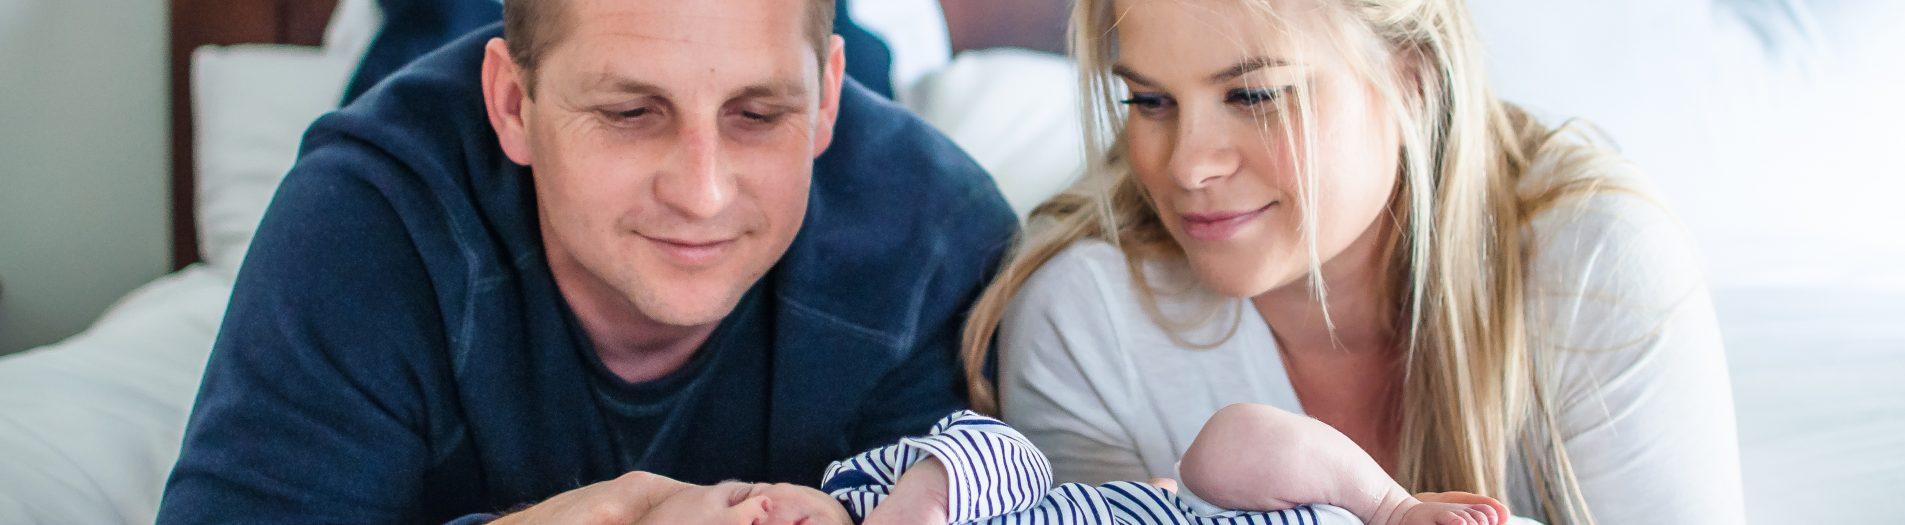 Baby J's Newborn Session